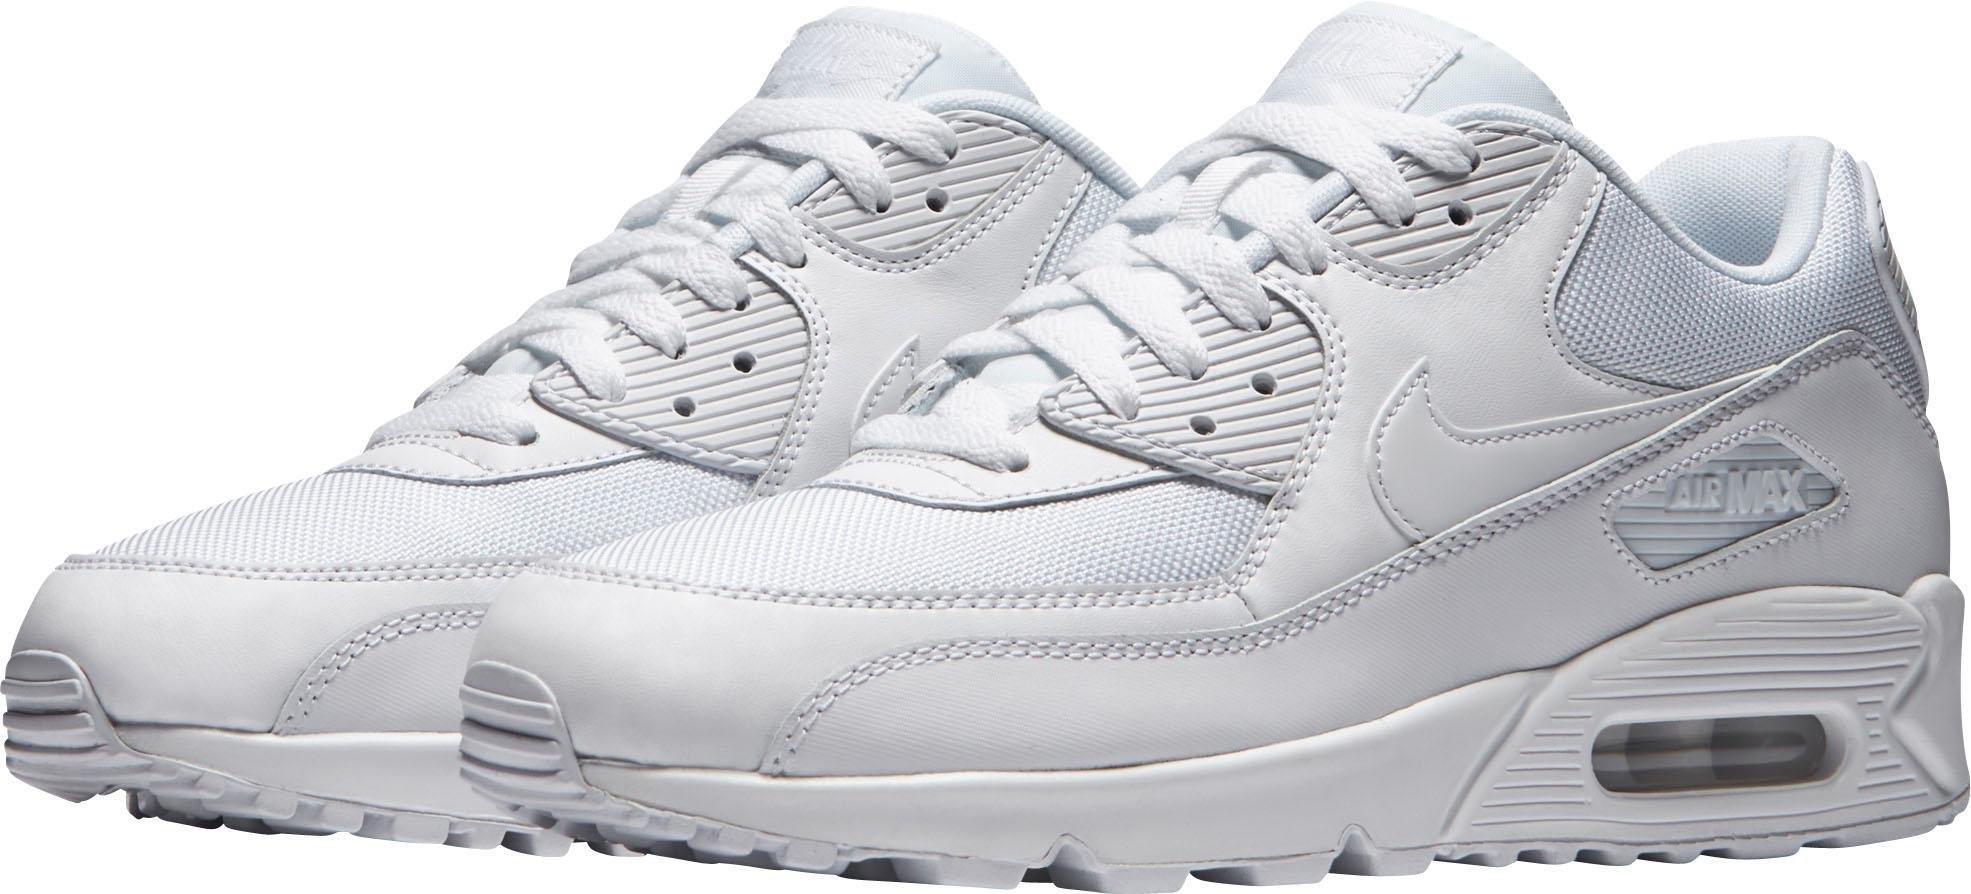 Nike Sportswear sneakers »Air Max 90 Essential« online kopen op otto.nl